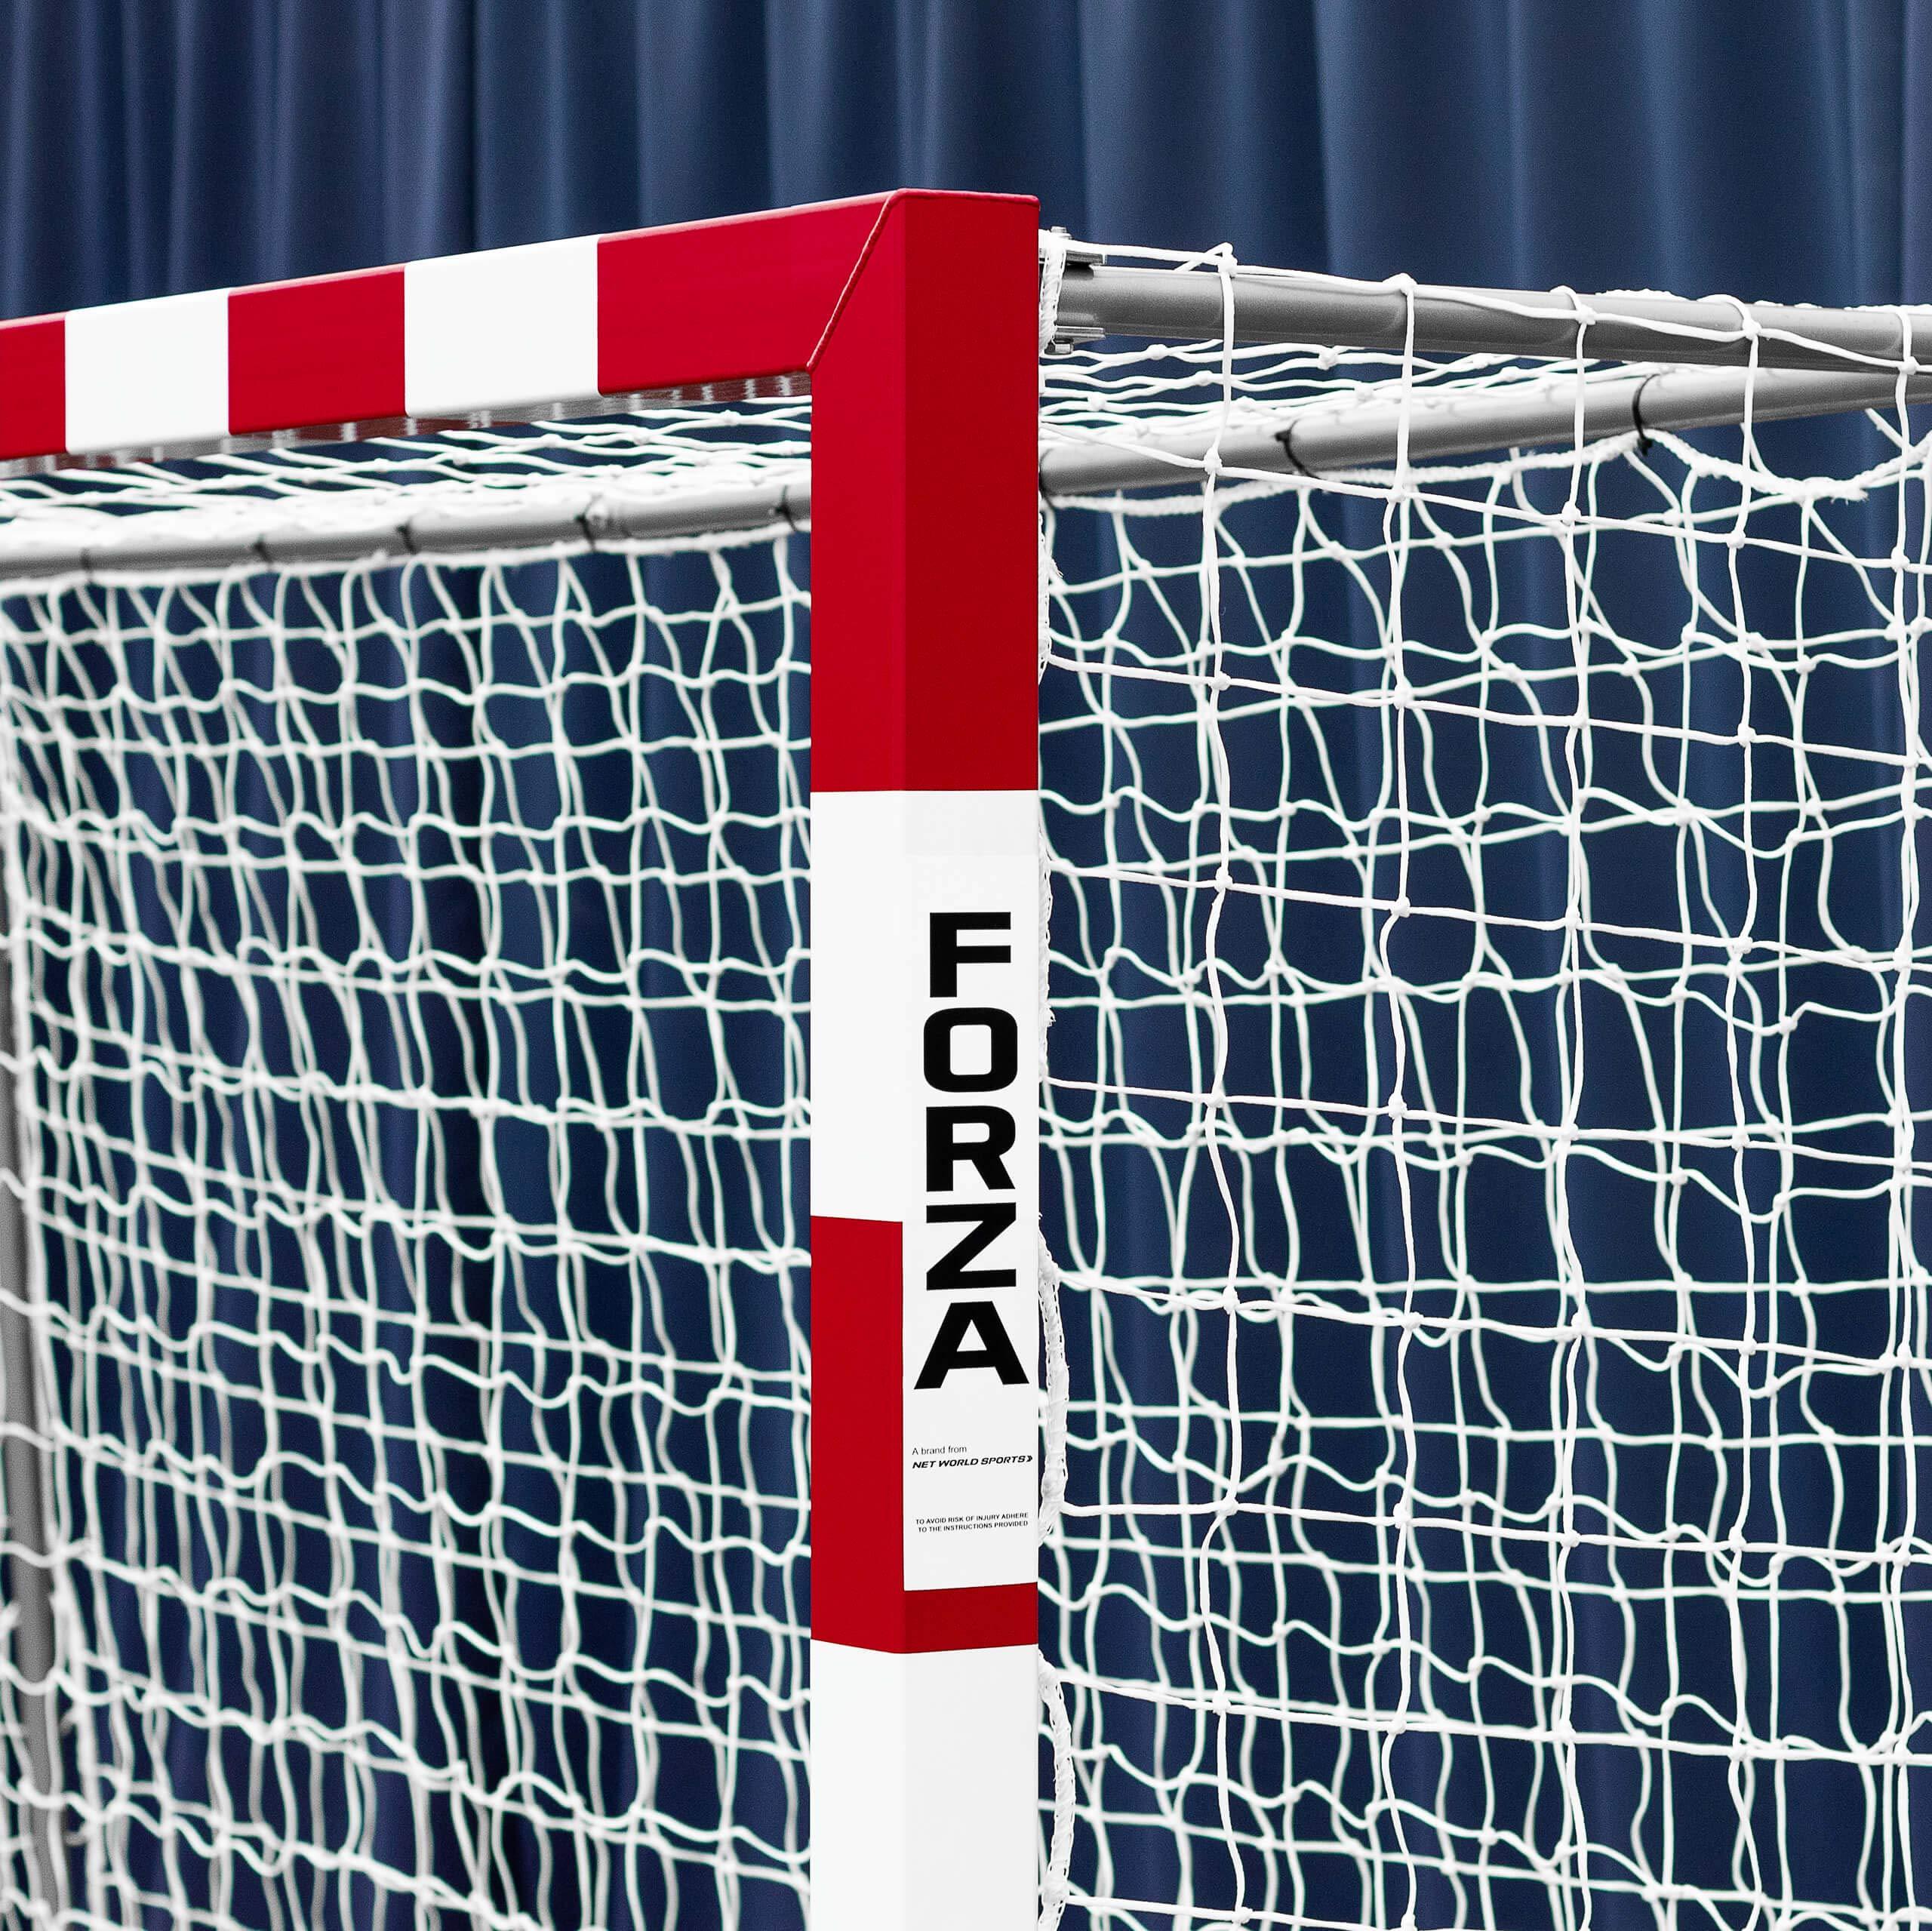 Forza Alu80 Competition Handball Goals | IHF Regulation Size 3m x 2m Handball Goal [Net World Sports] (Pair, Red) by Forza (Image #3)